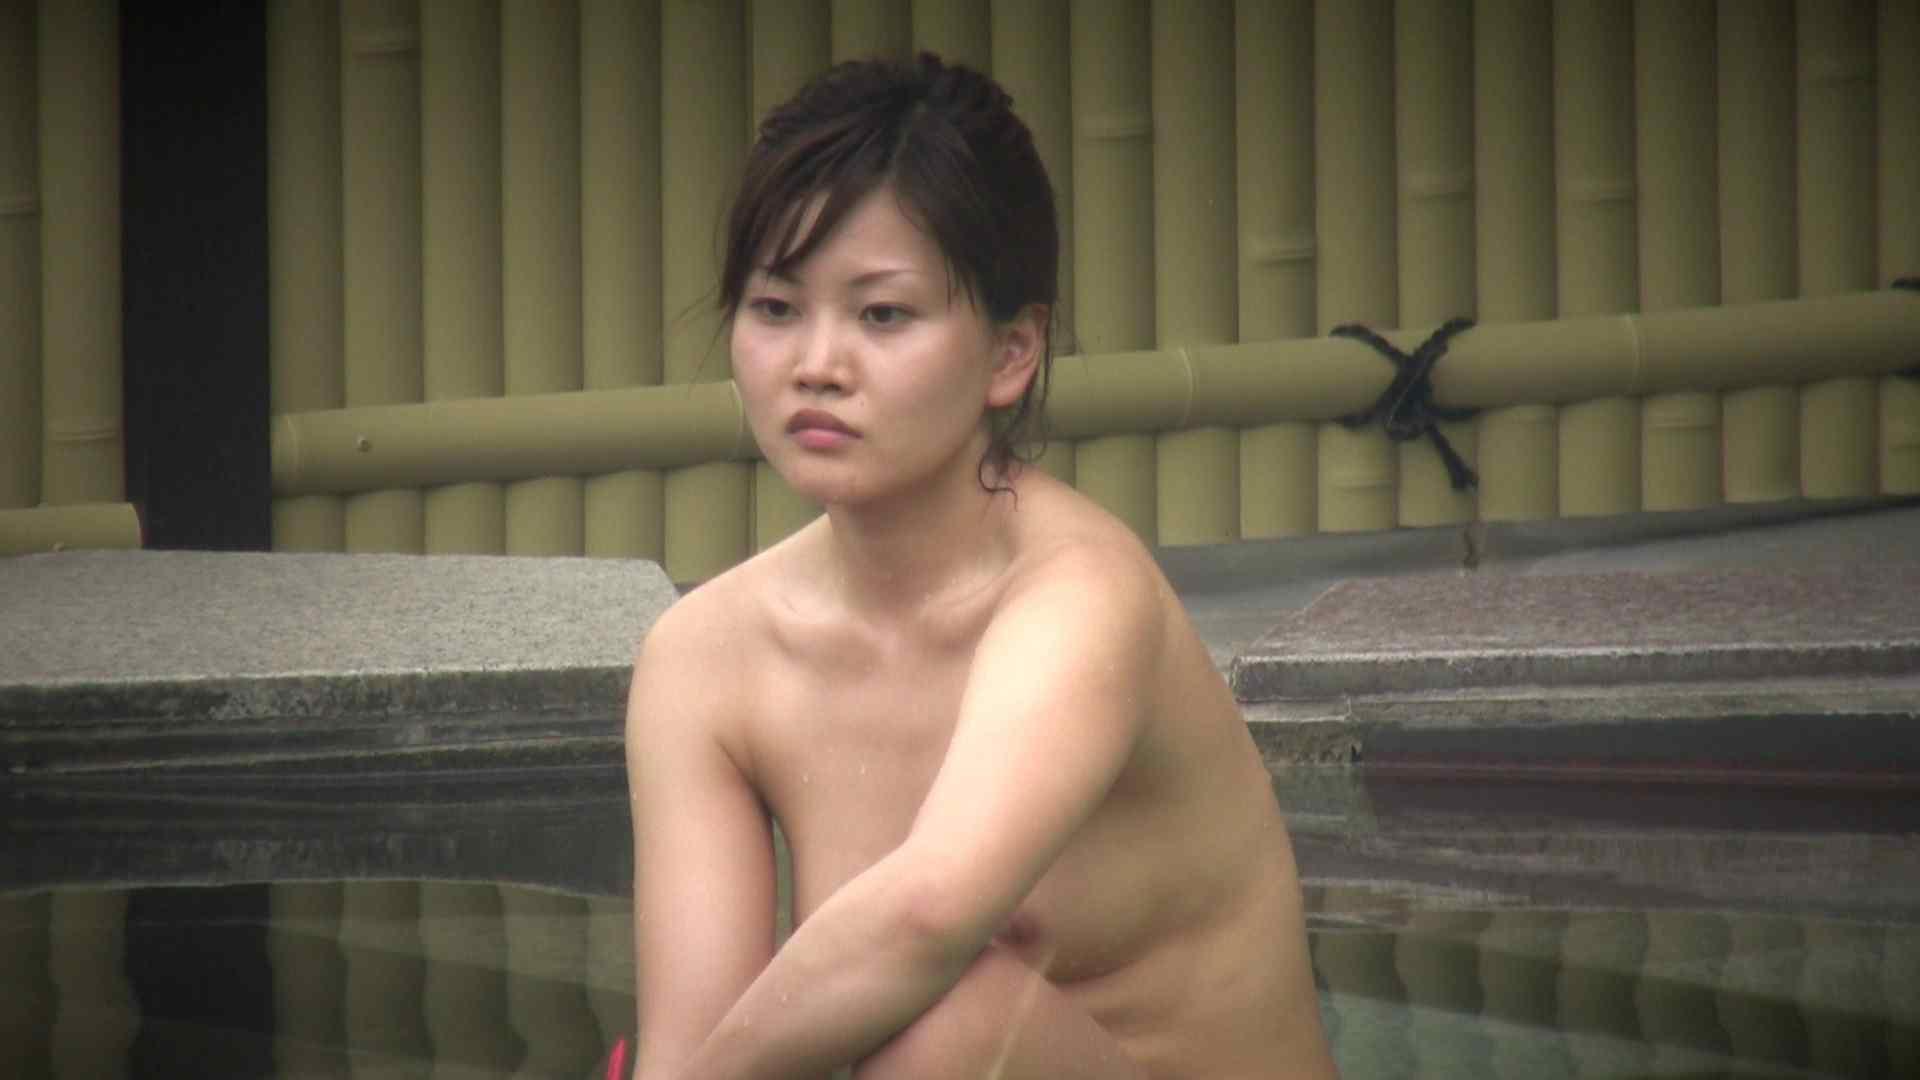 Aquaな露天風呂Vol.125 0  26連発 6